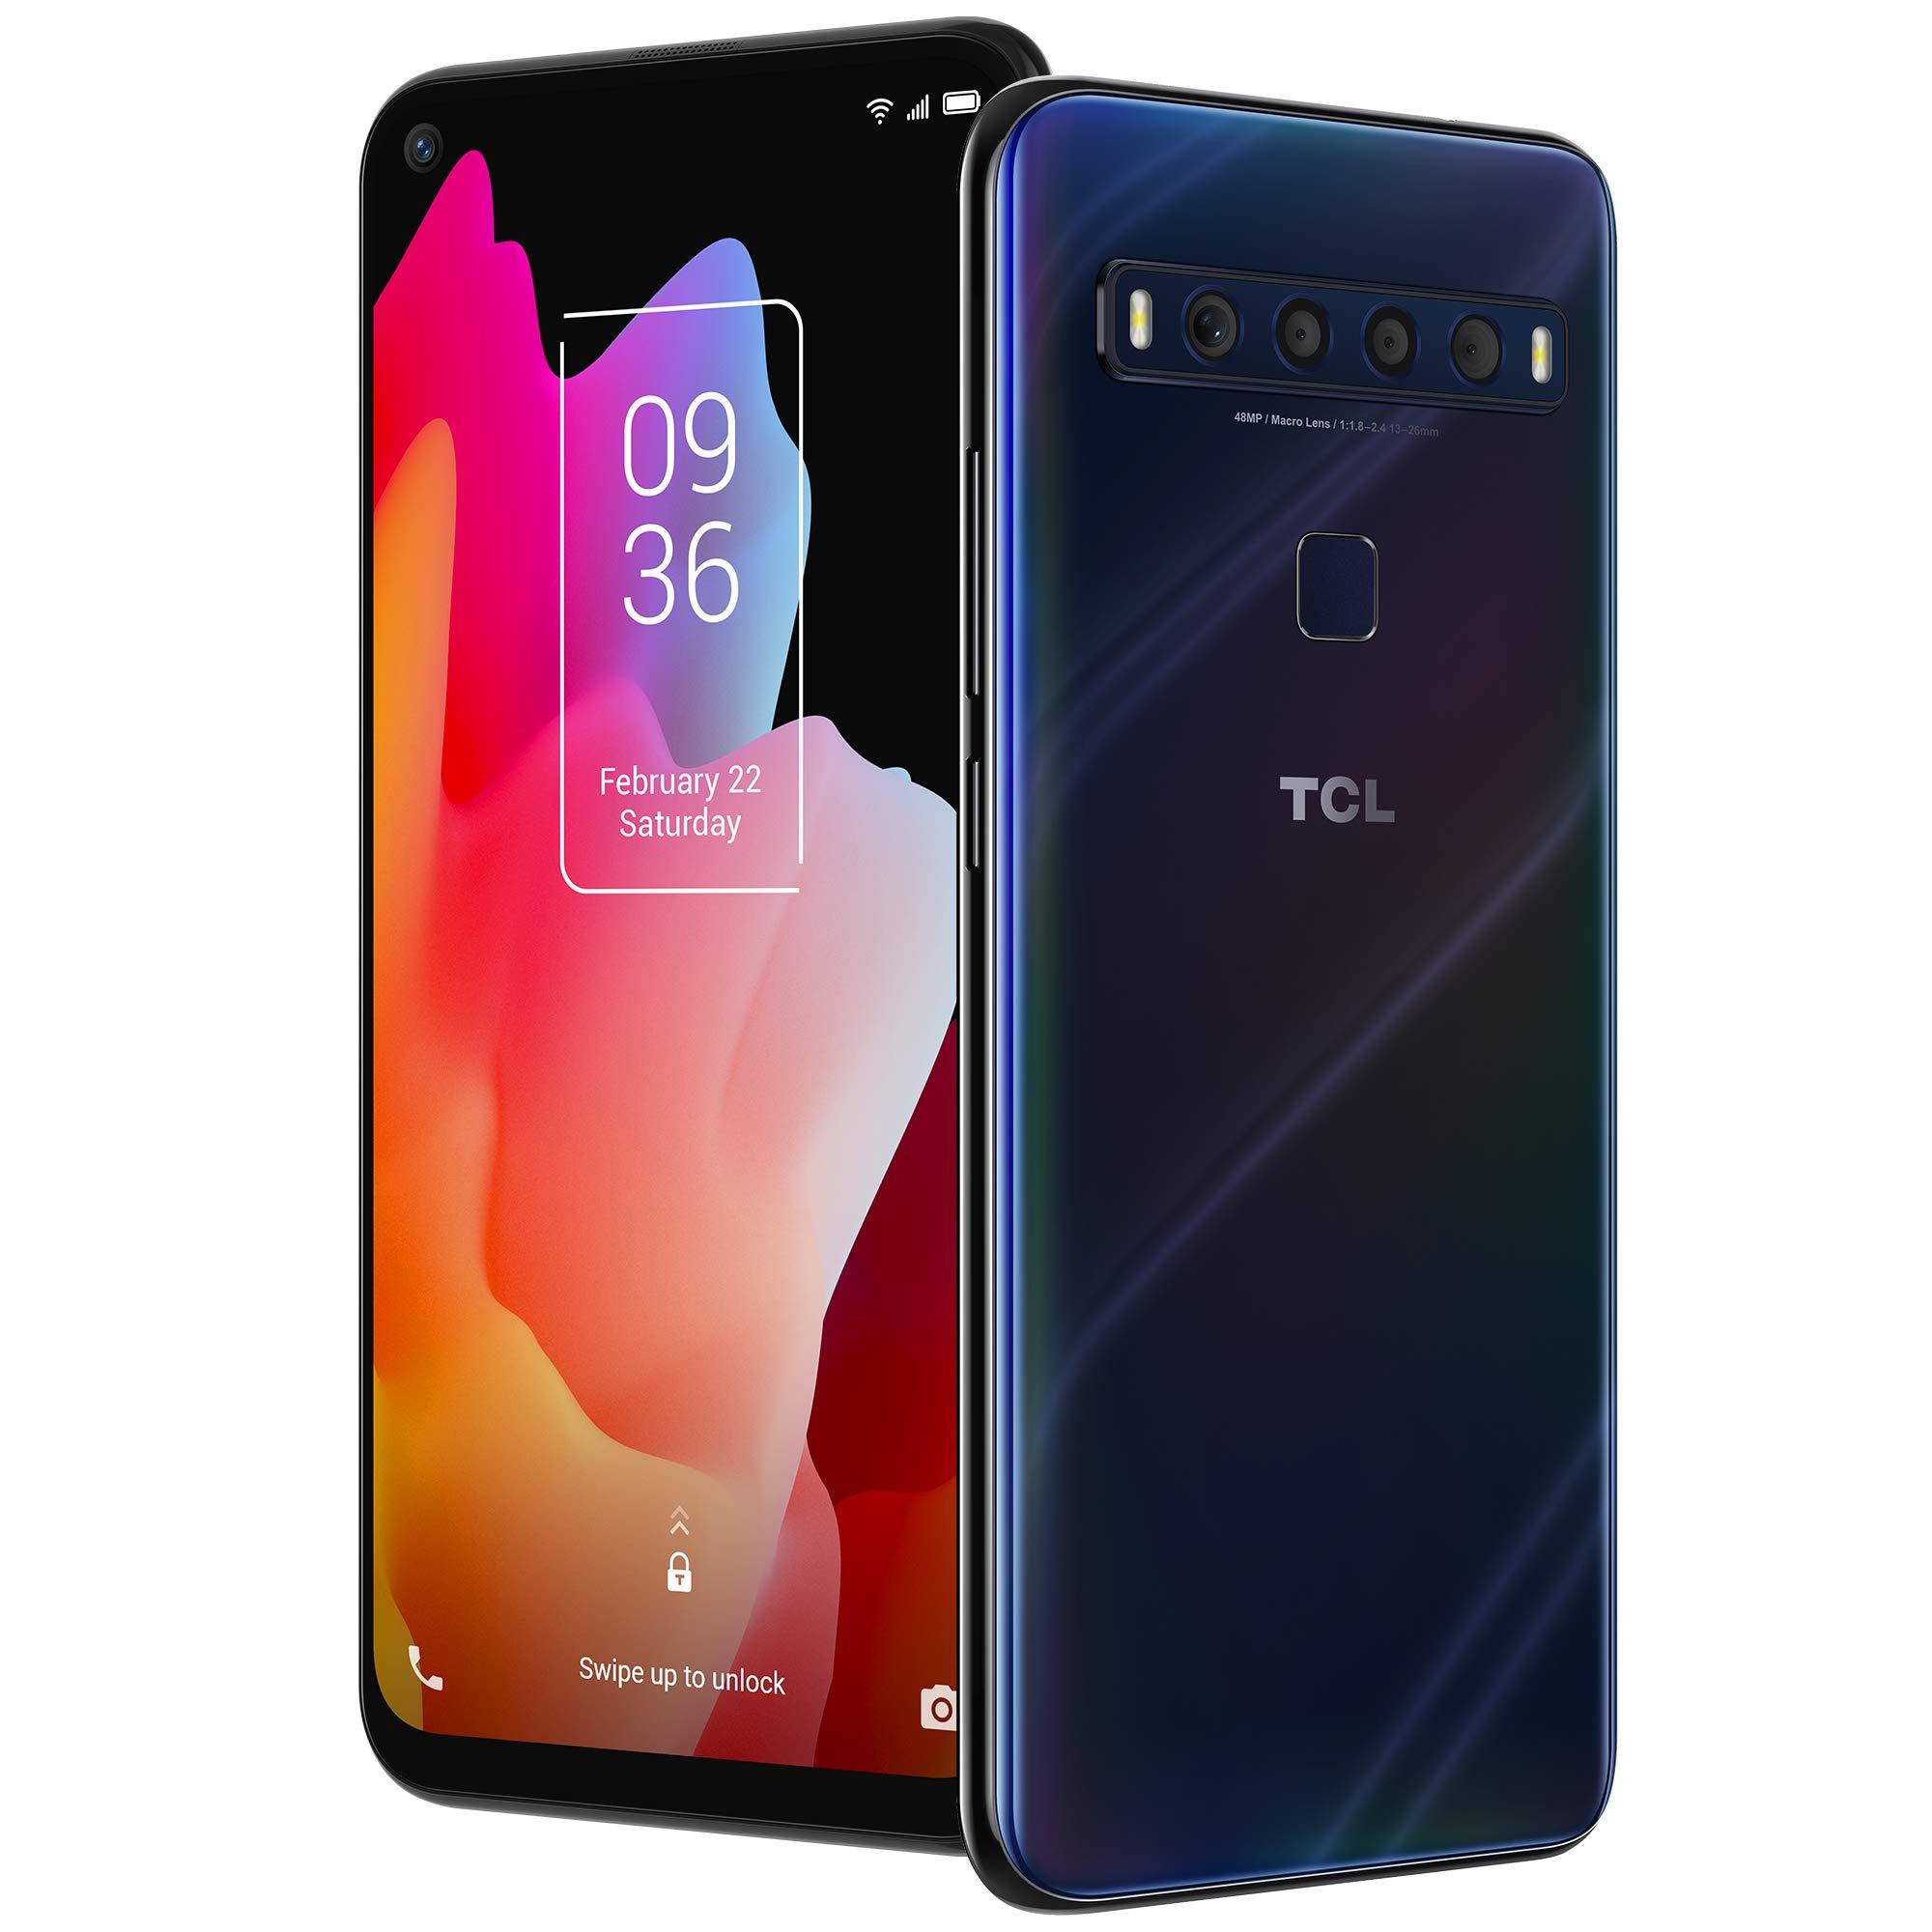 "TCL 10L, Unlocked Android Smartphone with 6.53"" FHD + LCD Display, 48MP Quad Rear Camera System, 64GB+6GB RAM, 4000mAh Bat..."